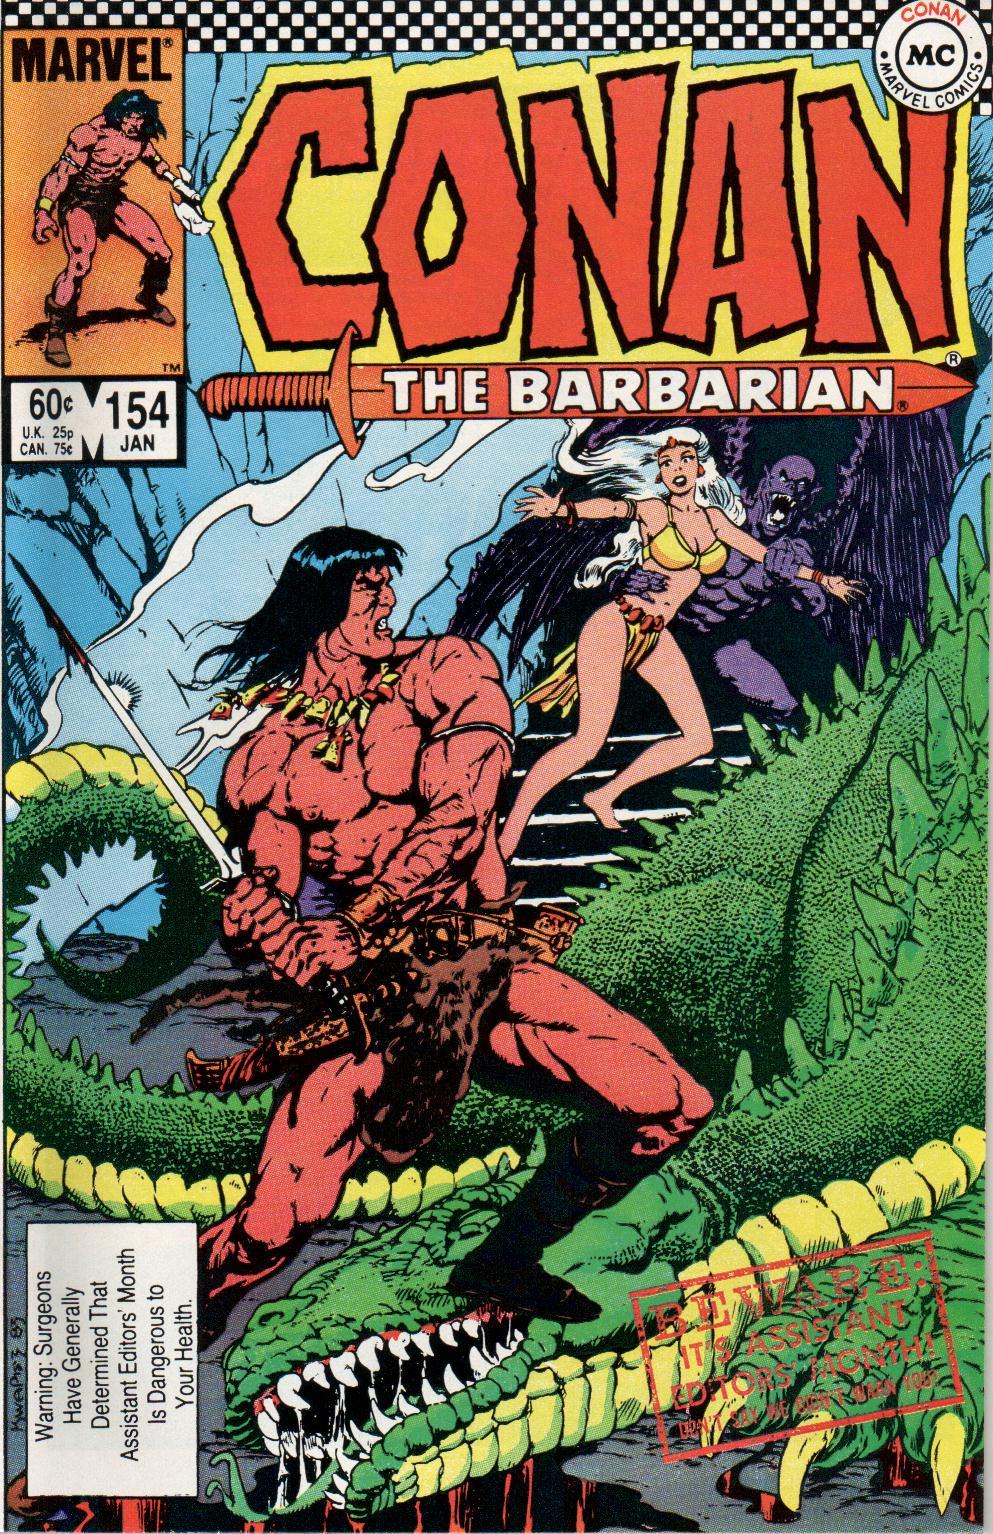 Conan the Barbarian 154